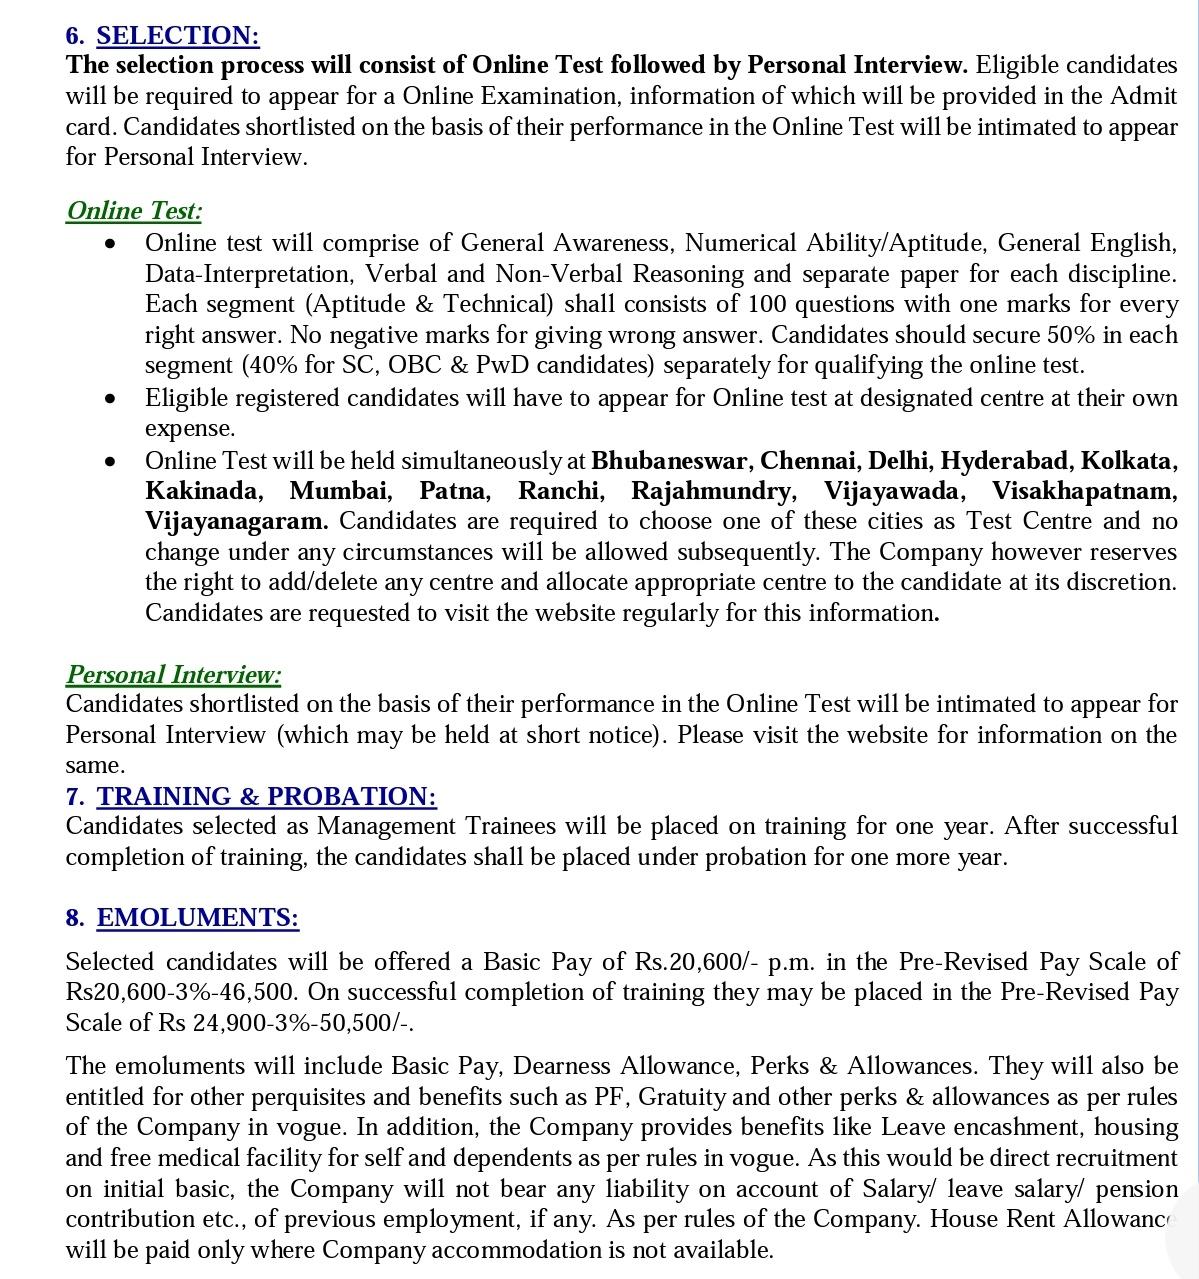 RNIL RECRUITMENT 2020 NOTIFICATION 188 MANAGEMENT TRAINEE